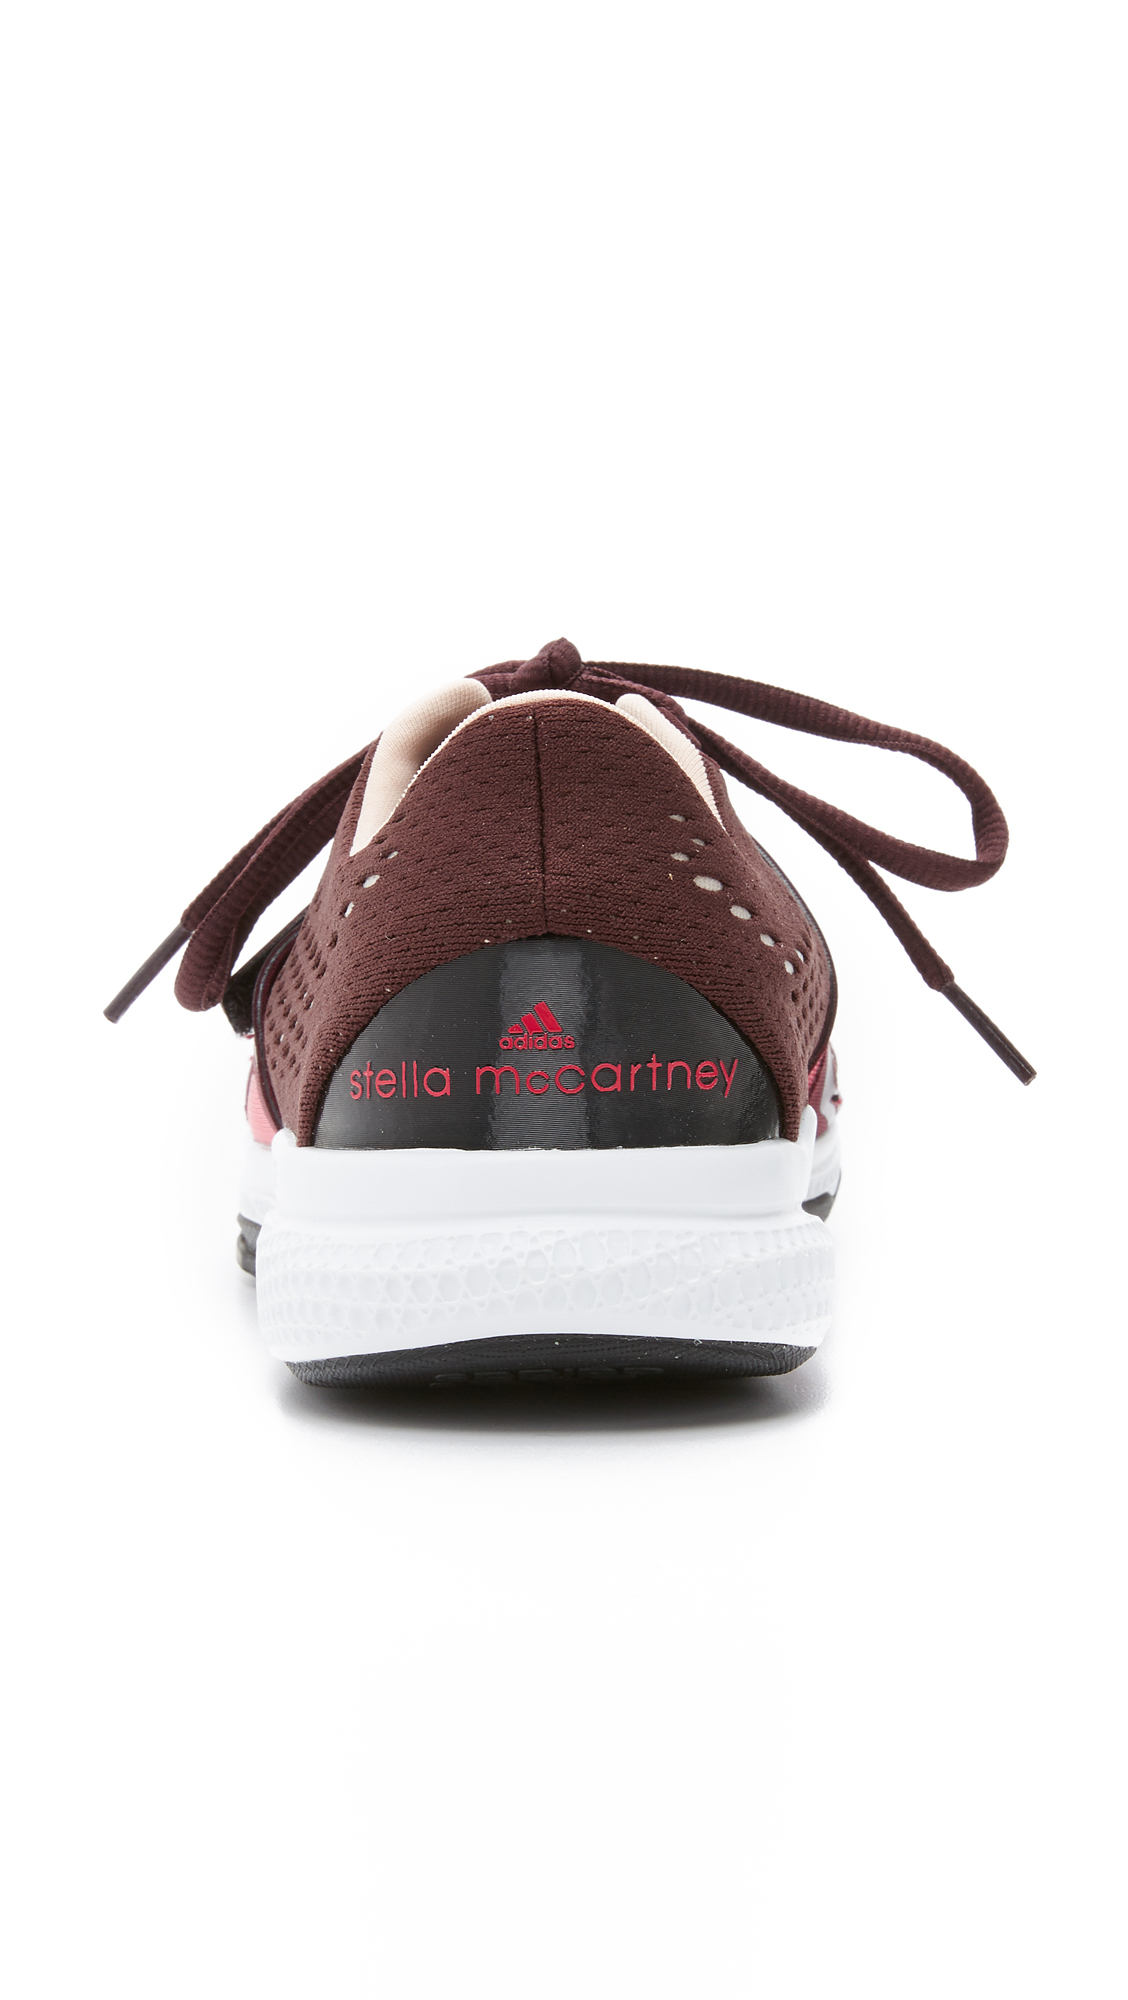 Adidas Da Stella Scarpe Mccartney Atani Rimbalzare Le Scarpe Stella Da Ginnastica In Viola Lyst cb9721